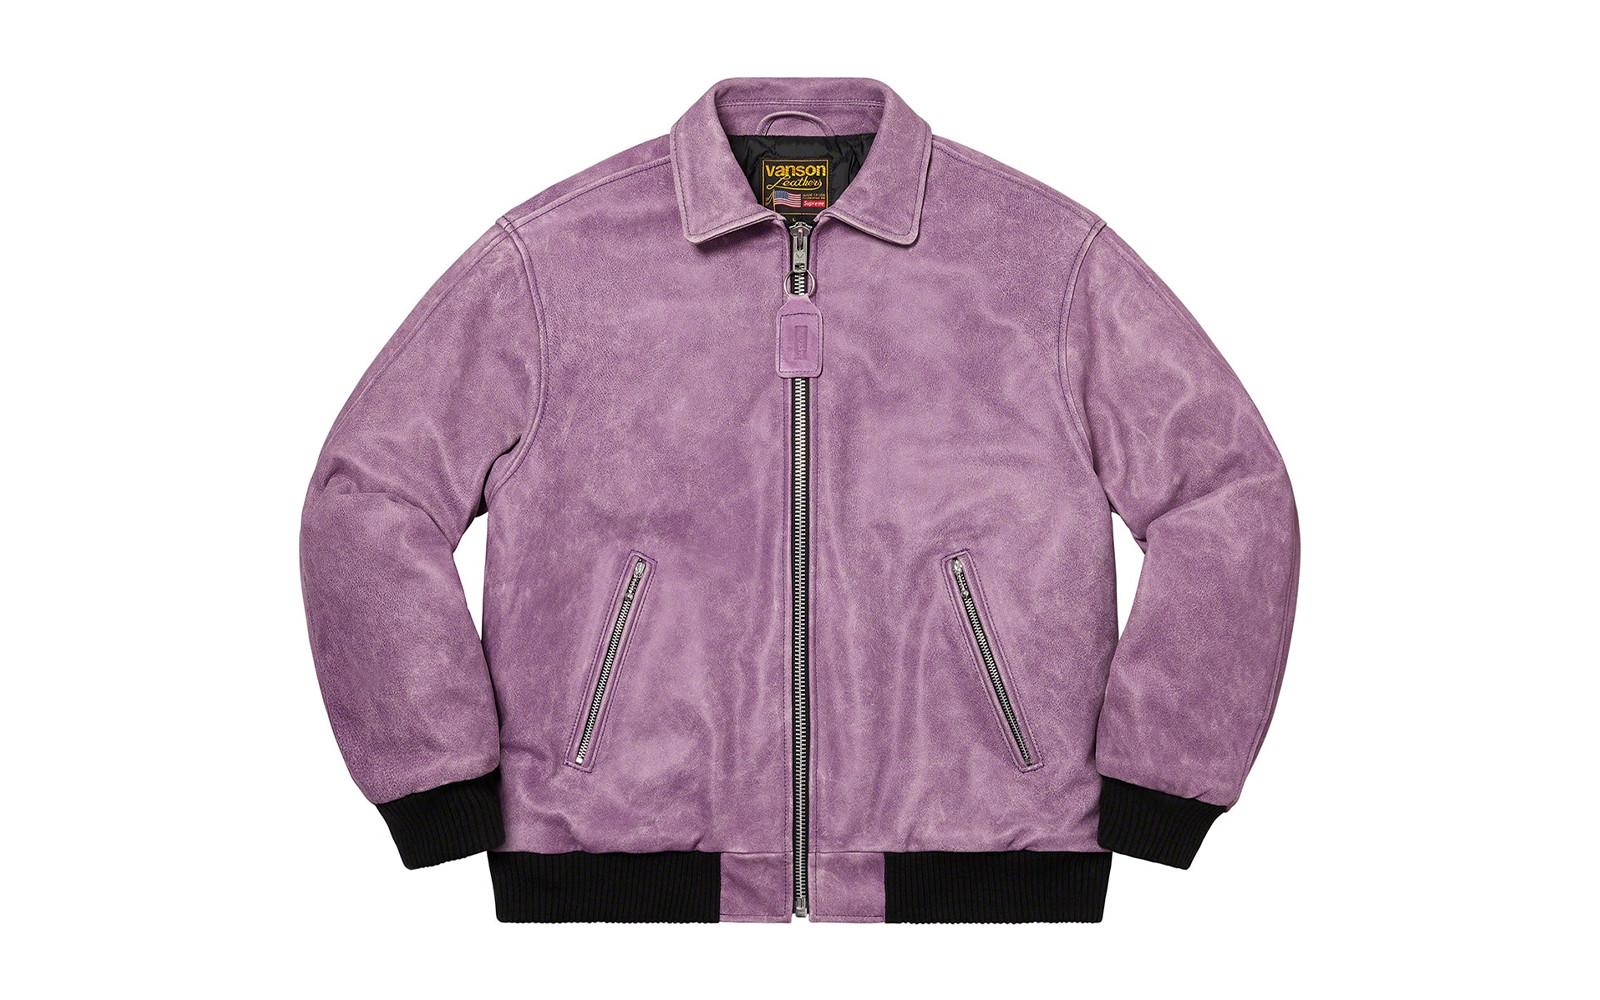 Supreme/Vanson Leathers Worn Leather Jacket